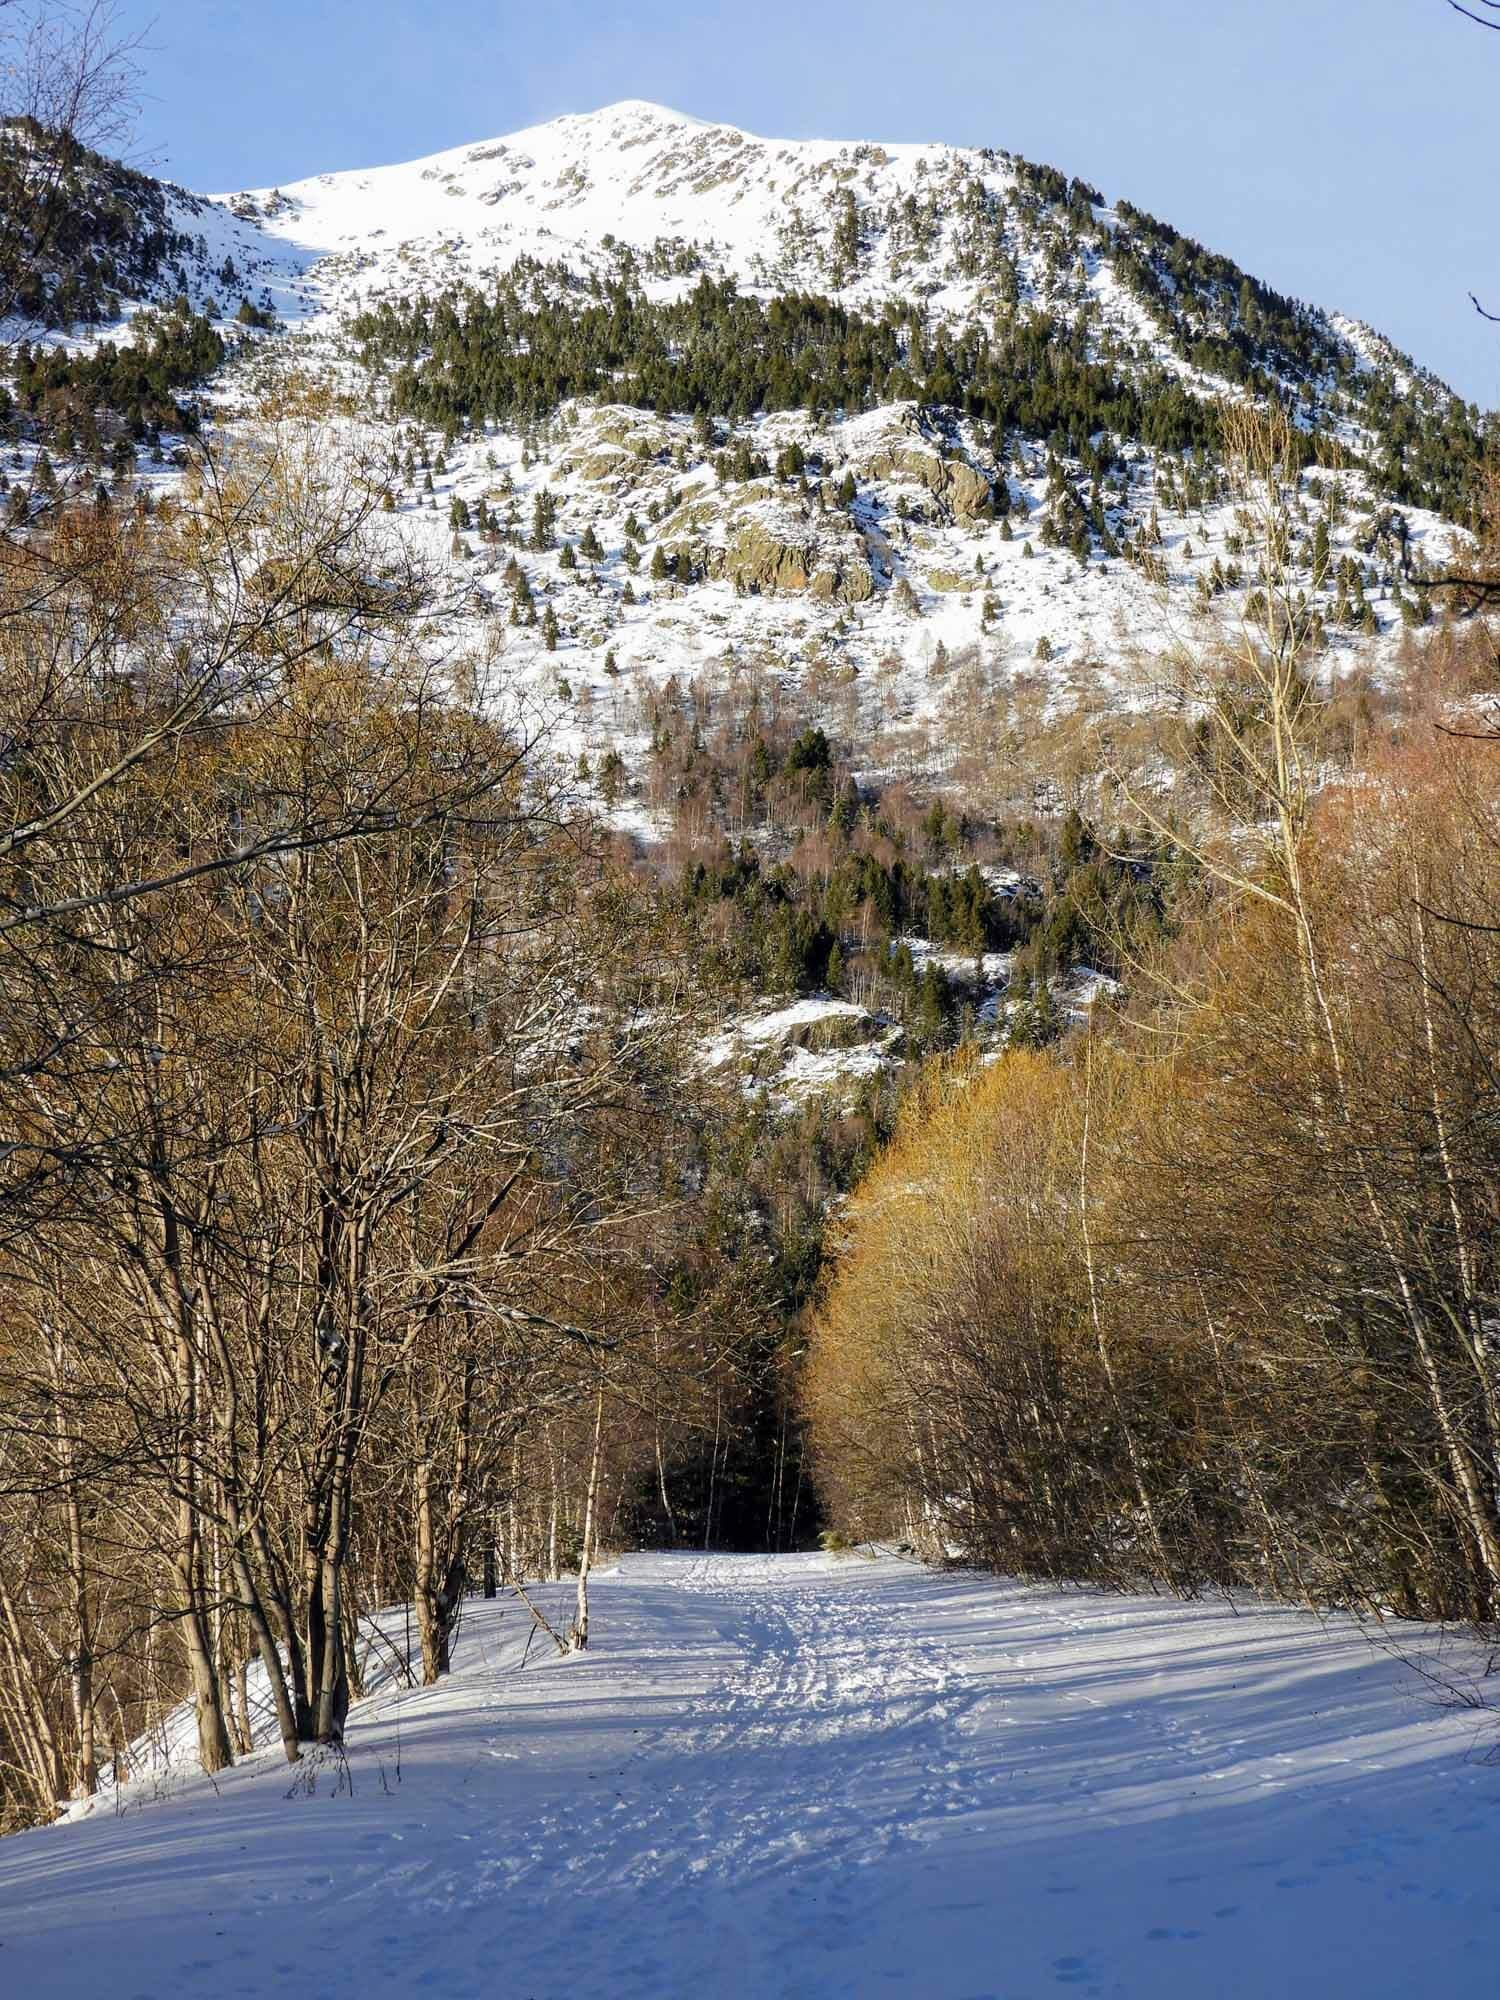 andorra-micro-nation-pyrenees-winter-mountains-snow.jpg